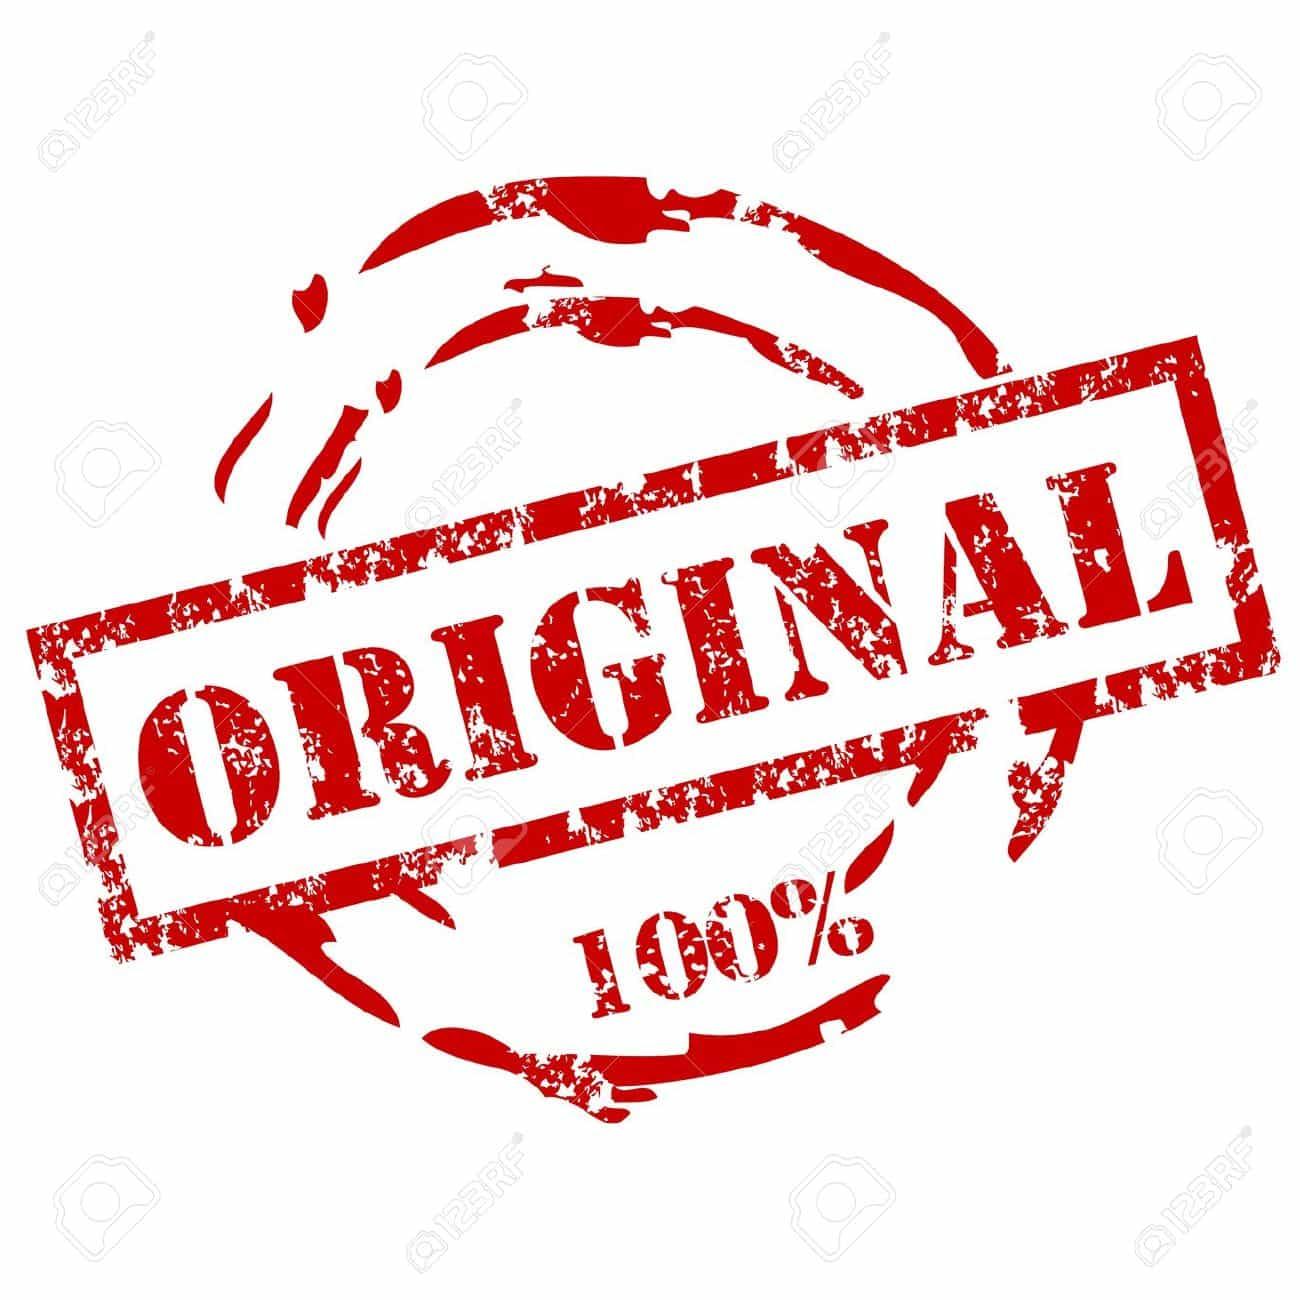 Being Original by Fox Emerson blogs